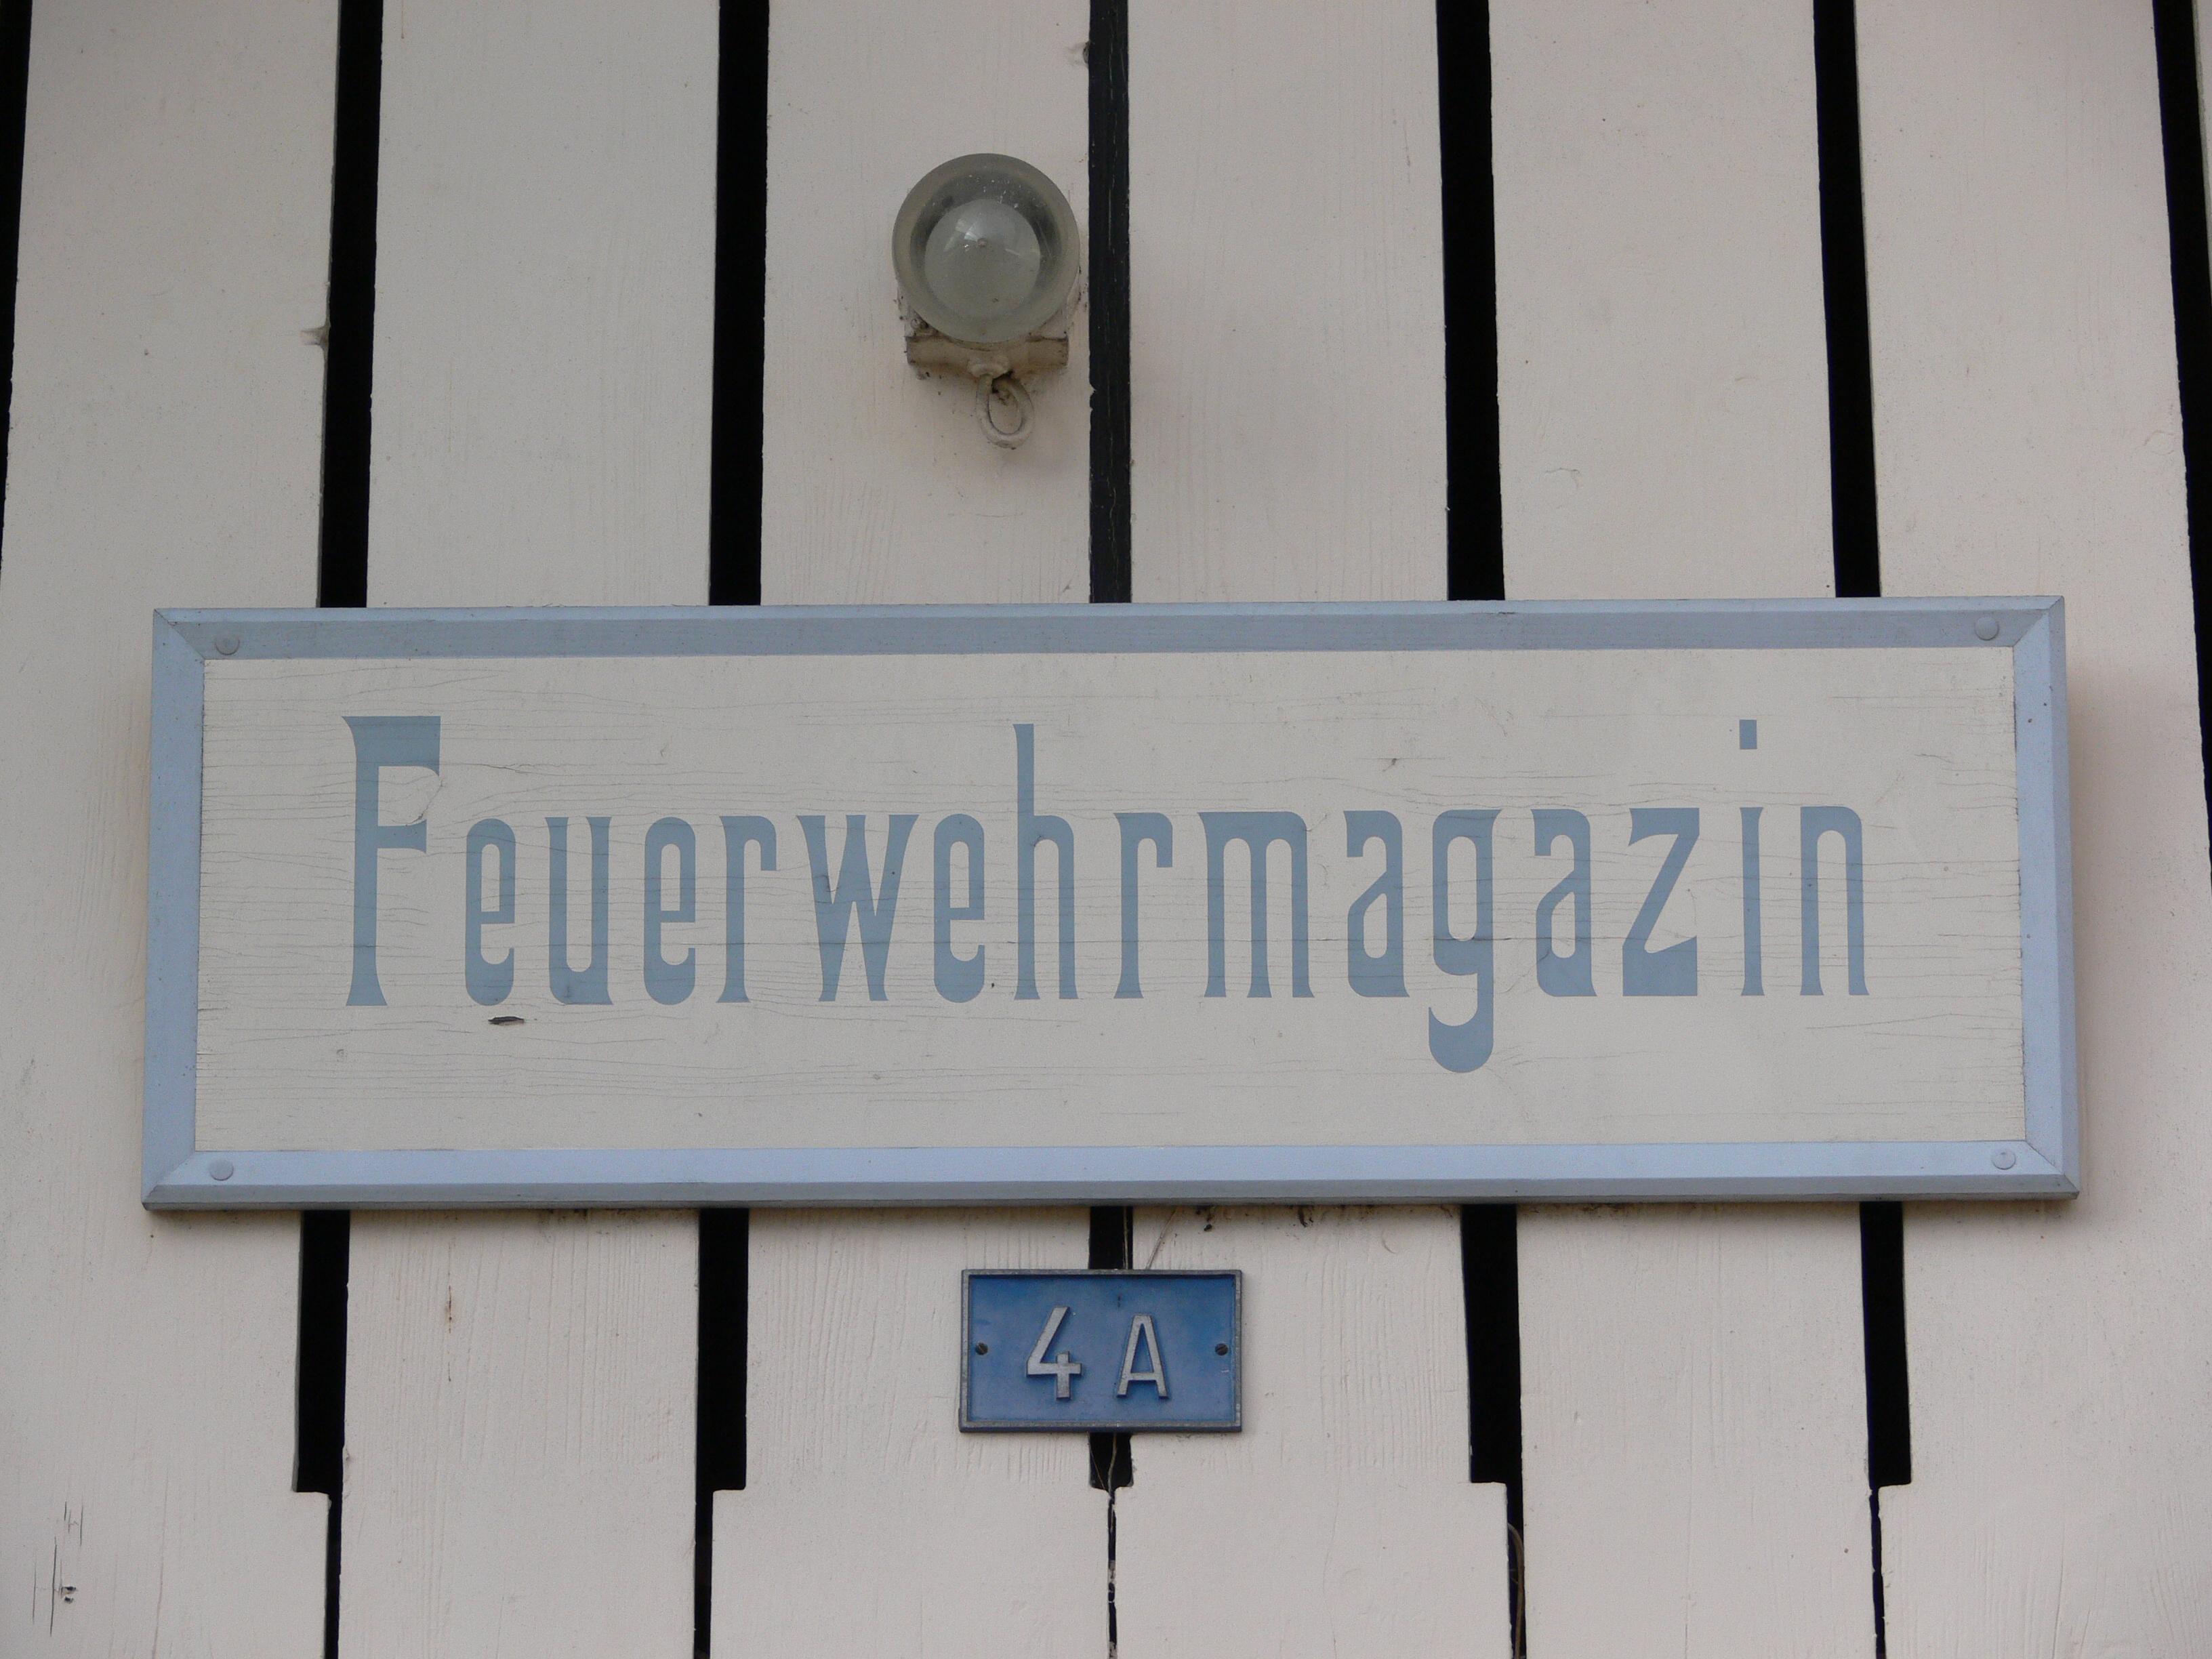 Fotos_Allmendingen-002